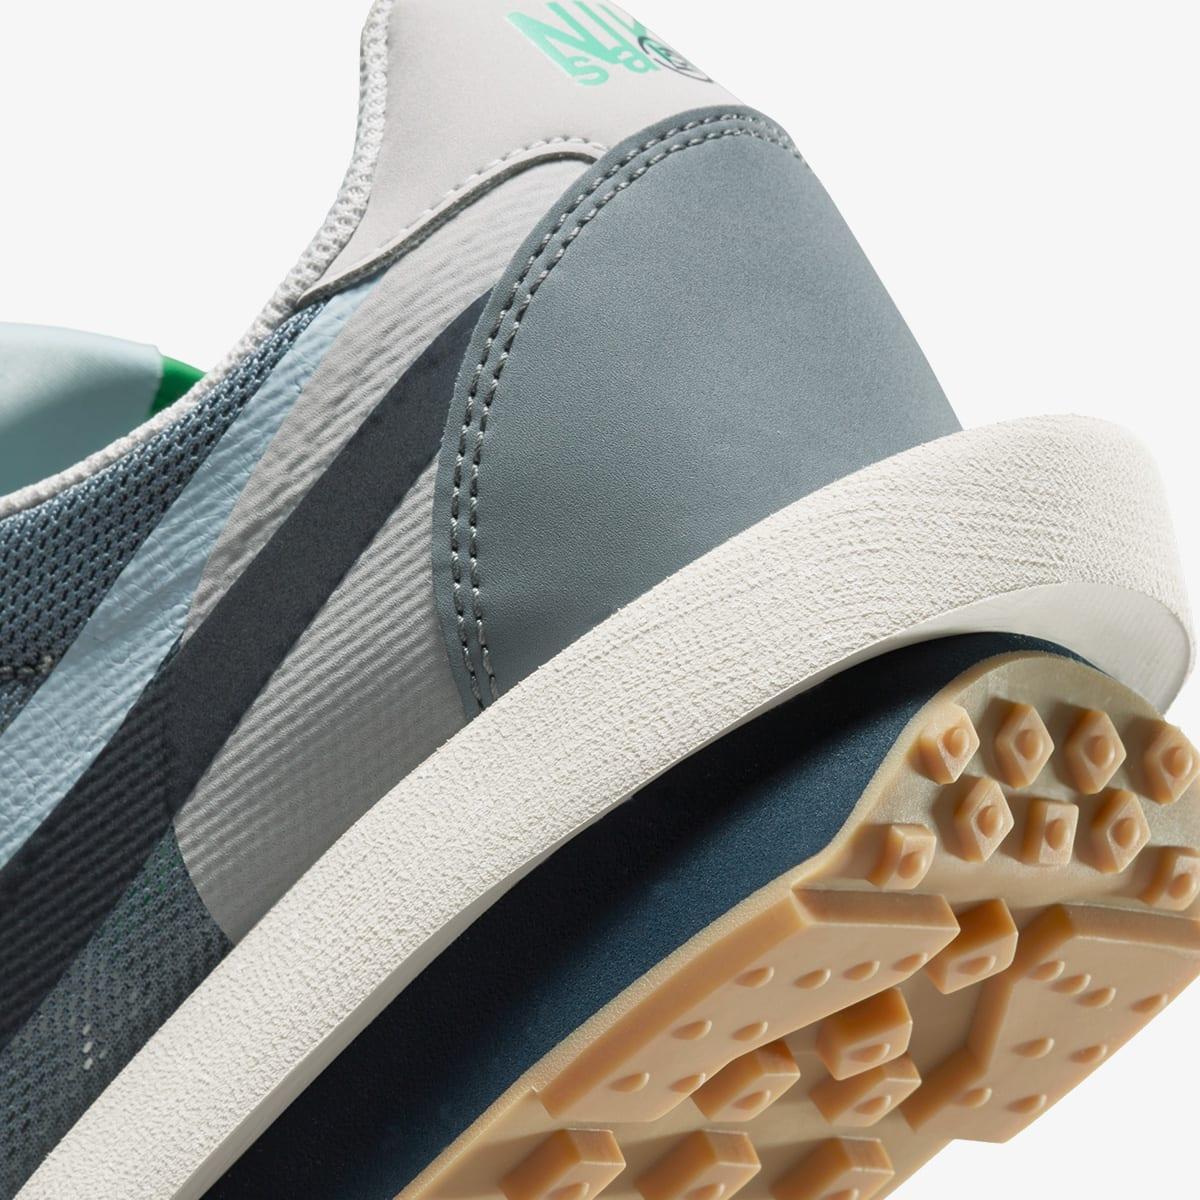 Nike x Sacai x Clot LDWaffle - DH3114-001